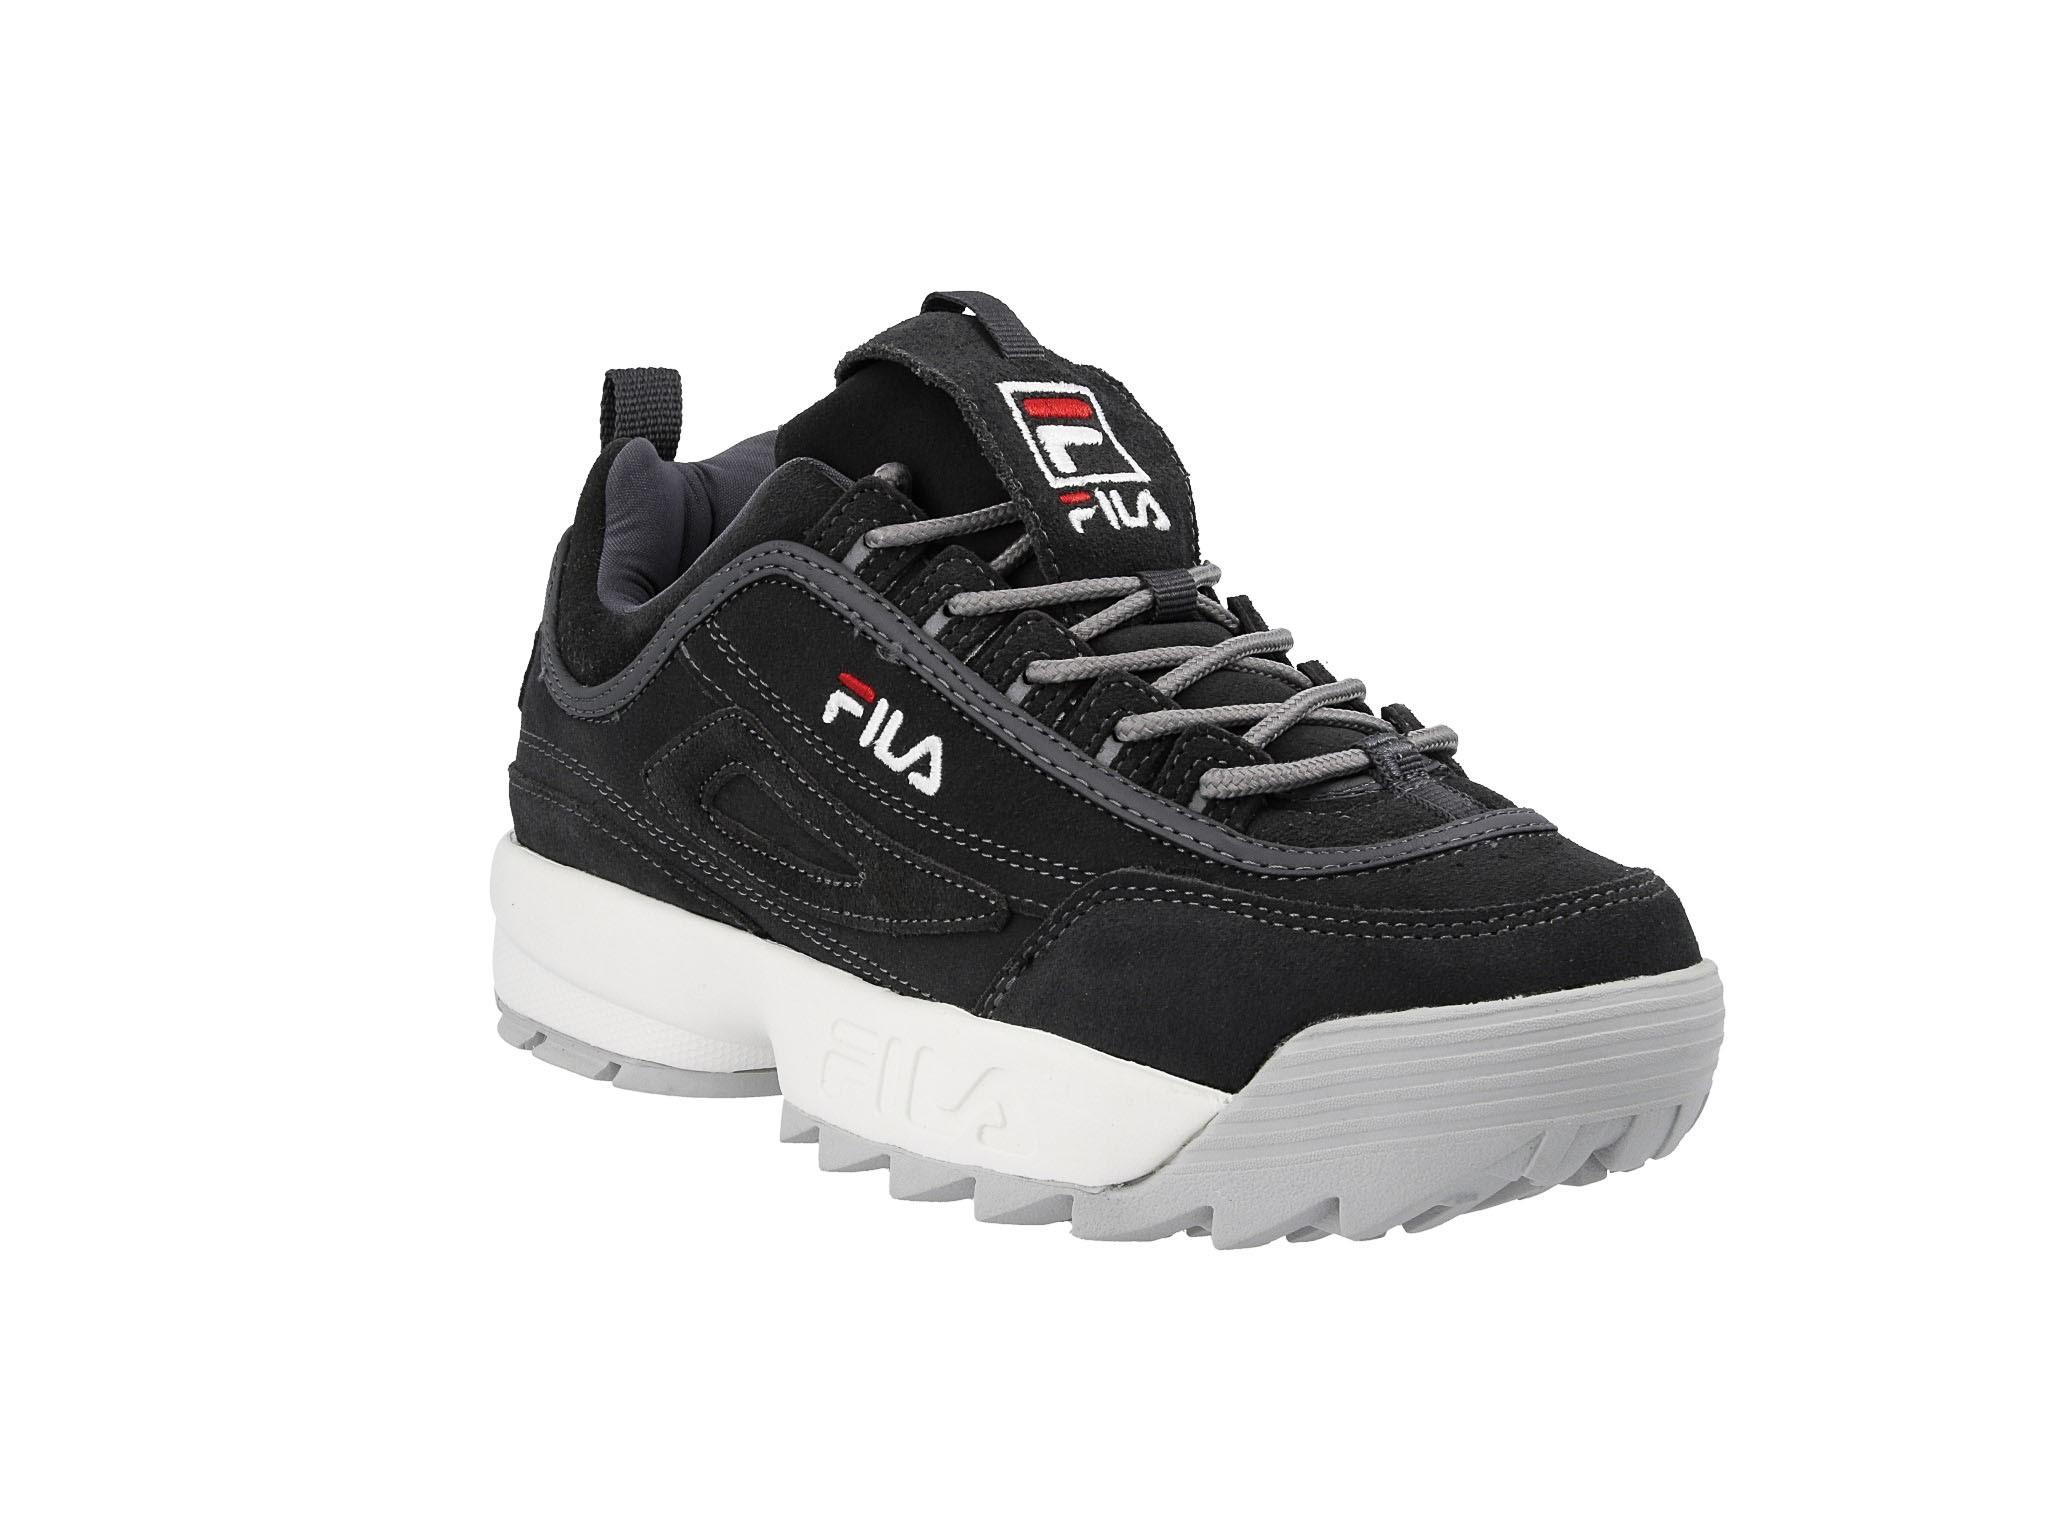 Sneakers FILA Disruptor S Low 1010577.7ZW Dark Shadow